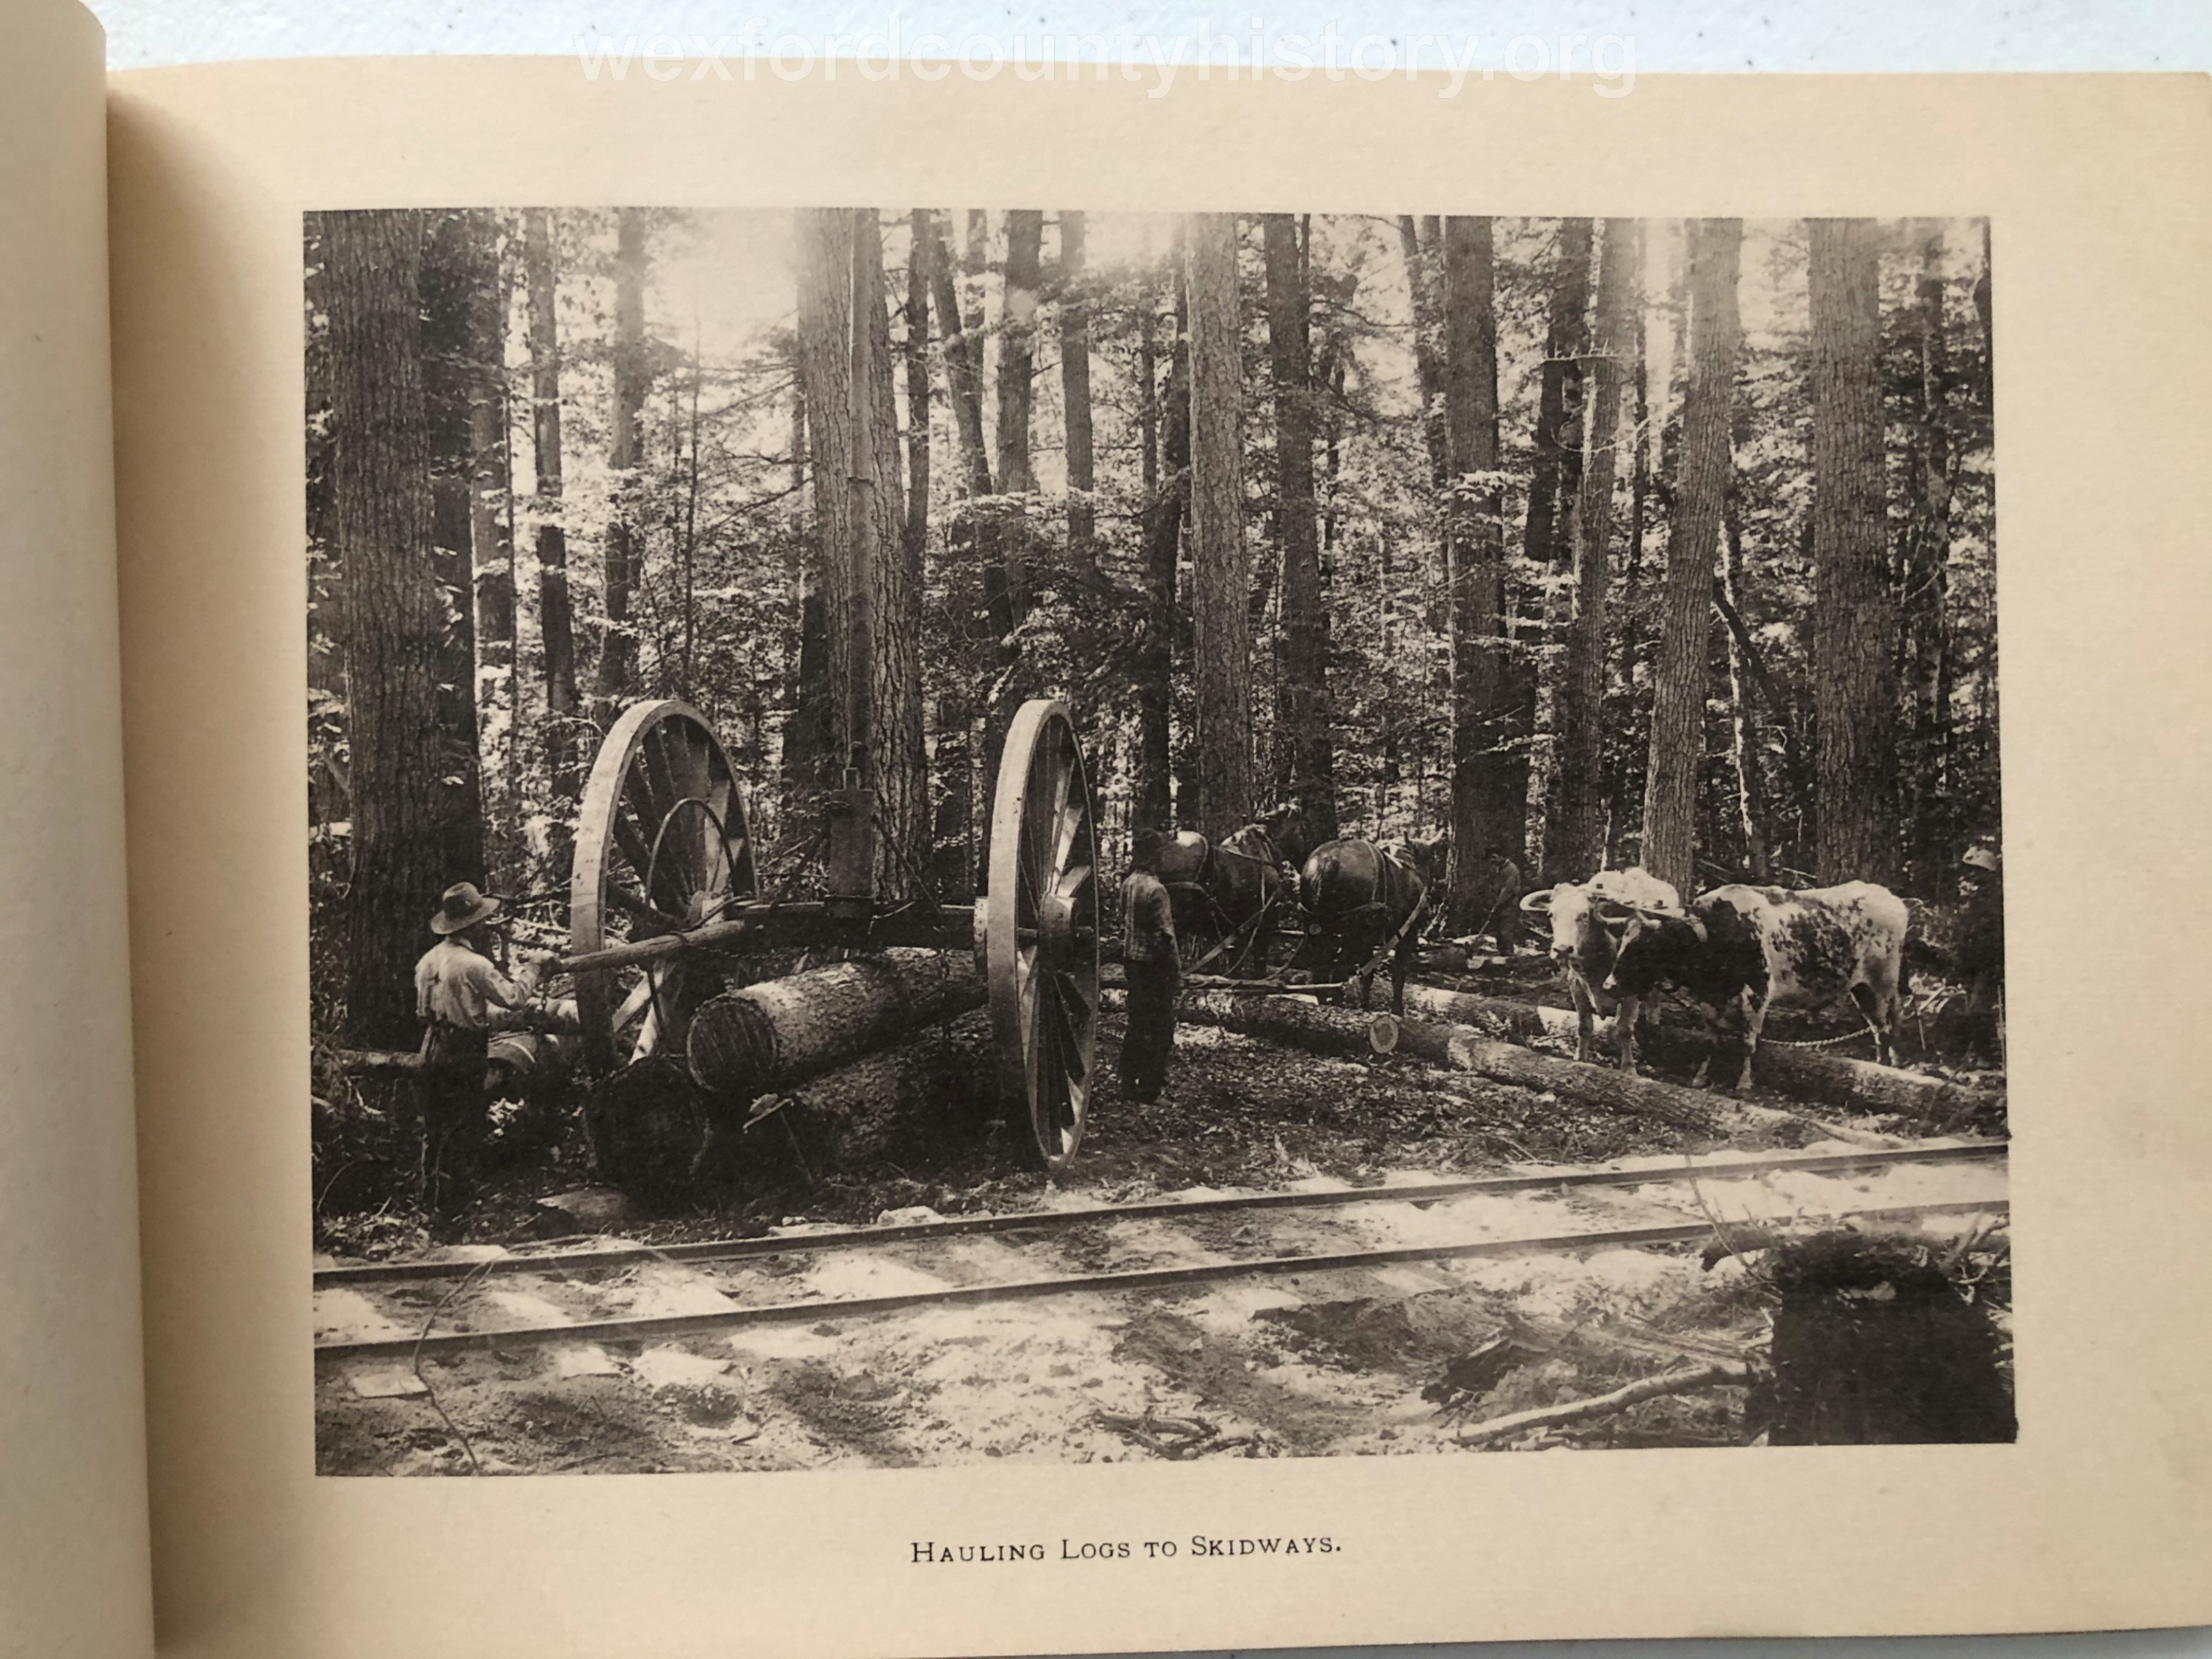 Cadillac-Lumber-Cummer-Workers-Hauling-Logs-To-Skidways-circa-1891